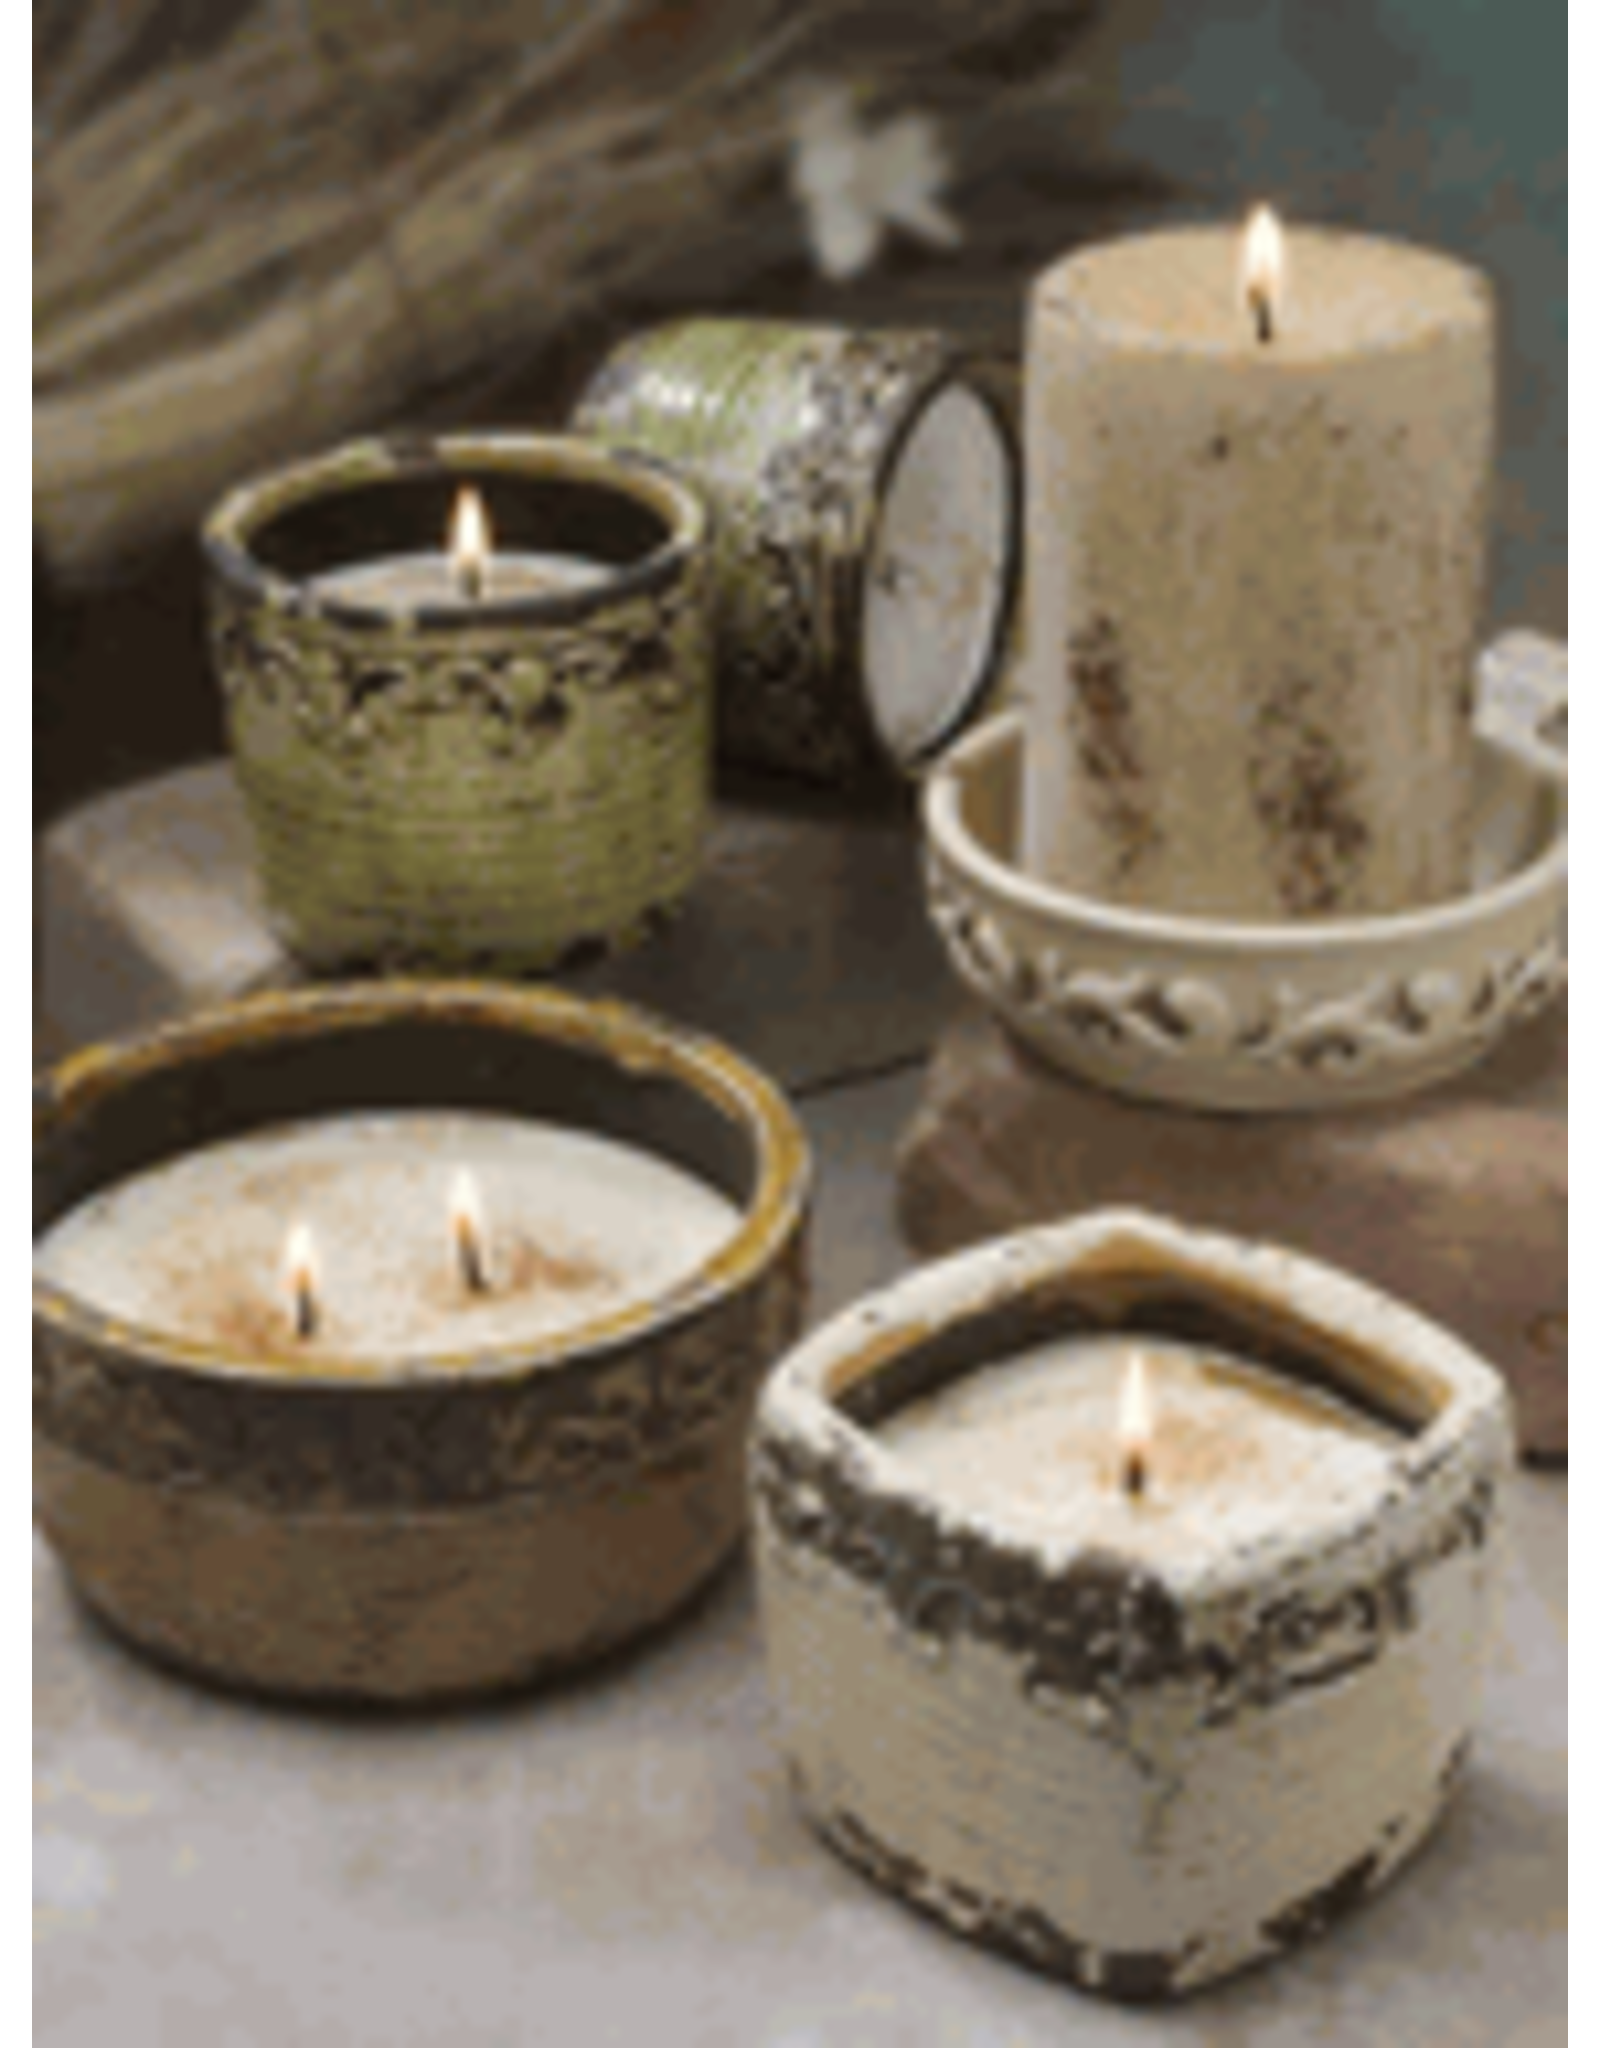 Swan Creek Candles Vintage Sq Pot Warm Cinnamon Buns